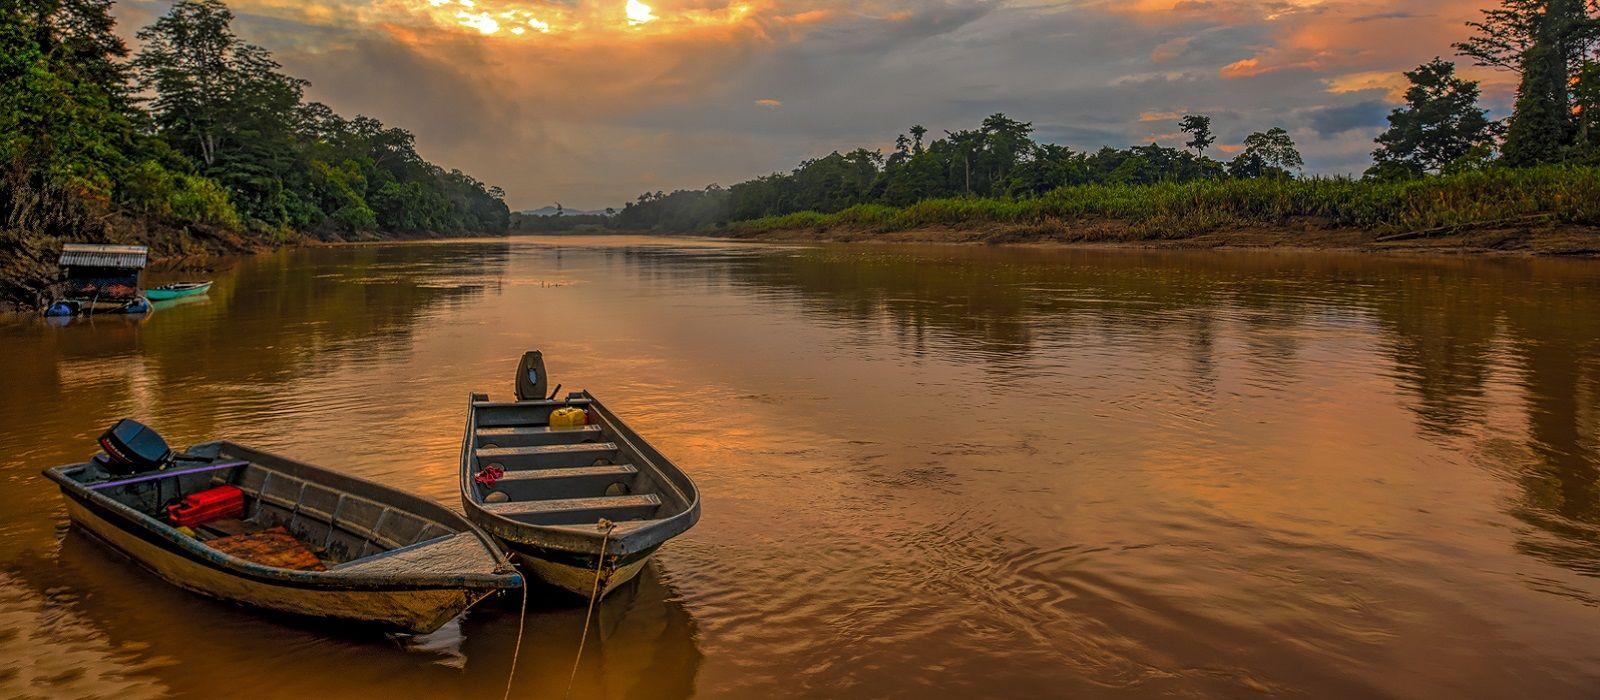 Wildnis und Strände Malaysias Urlaub 2